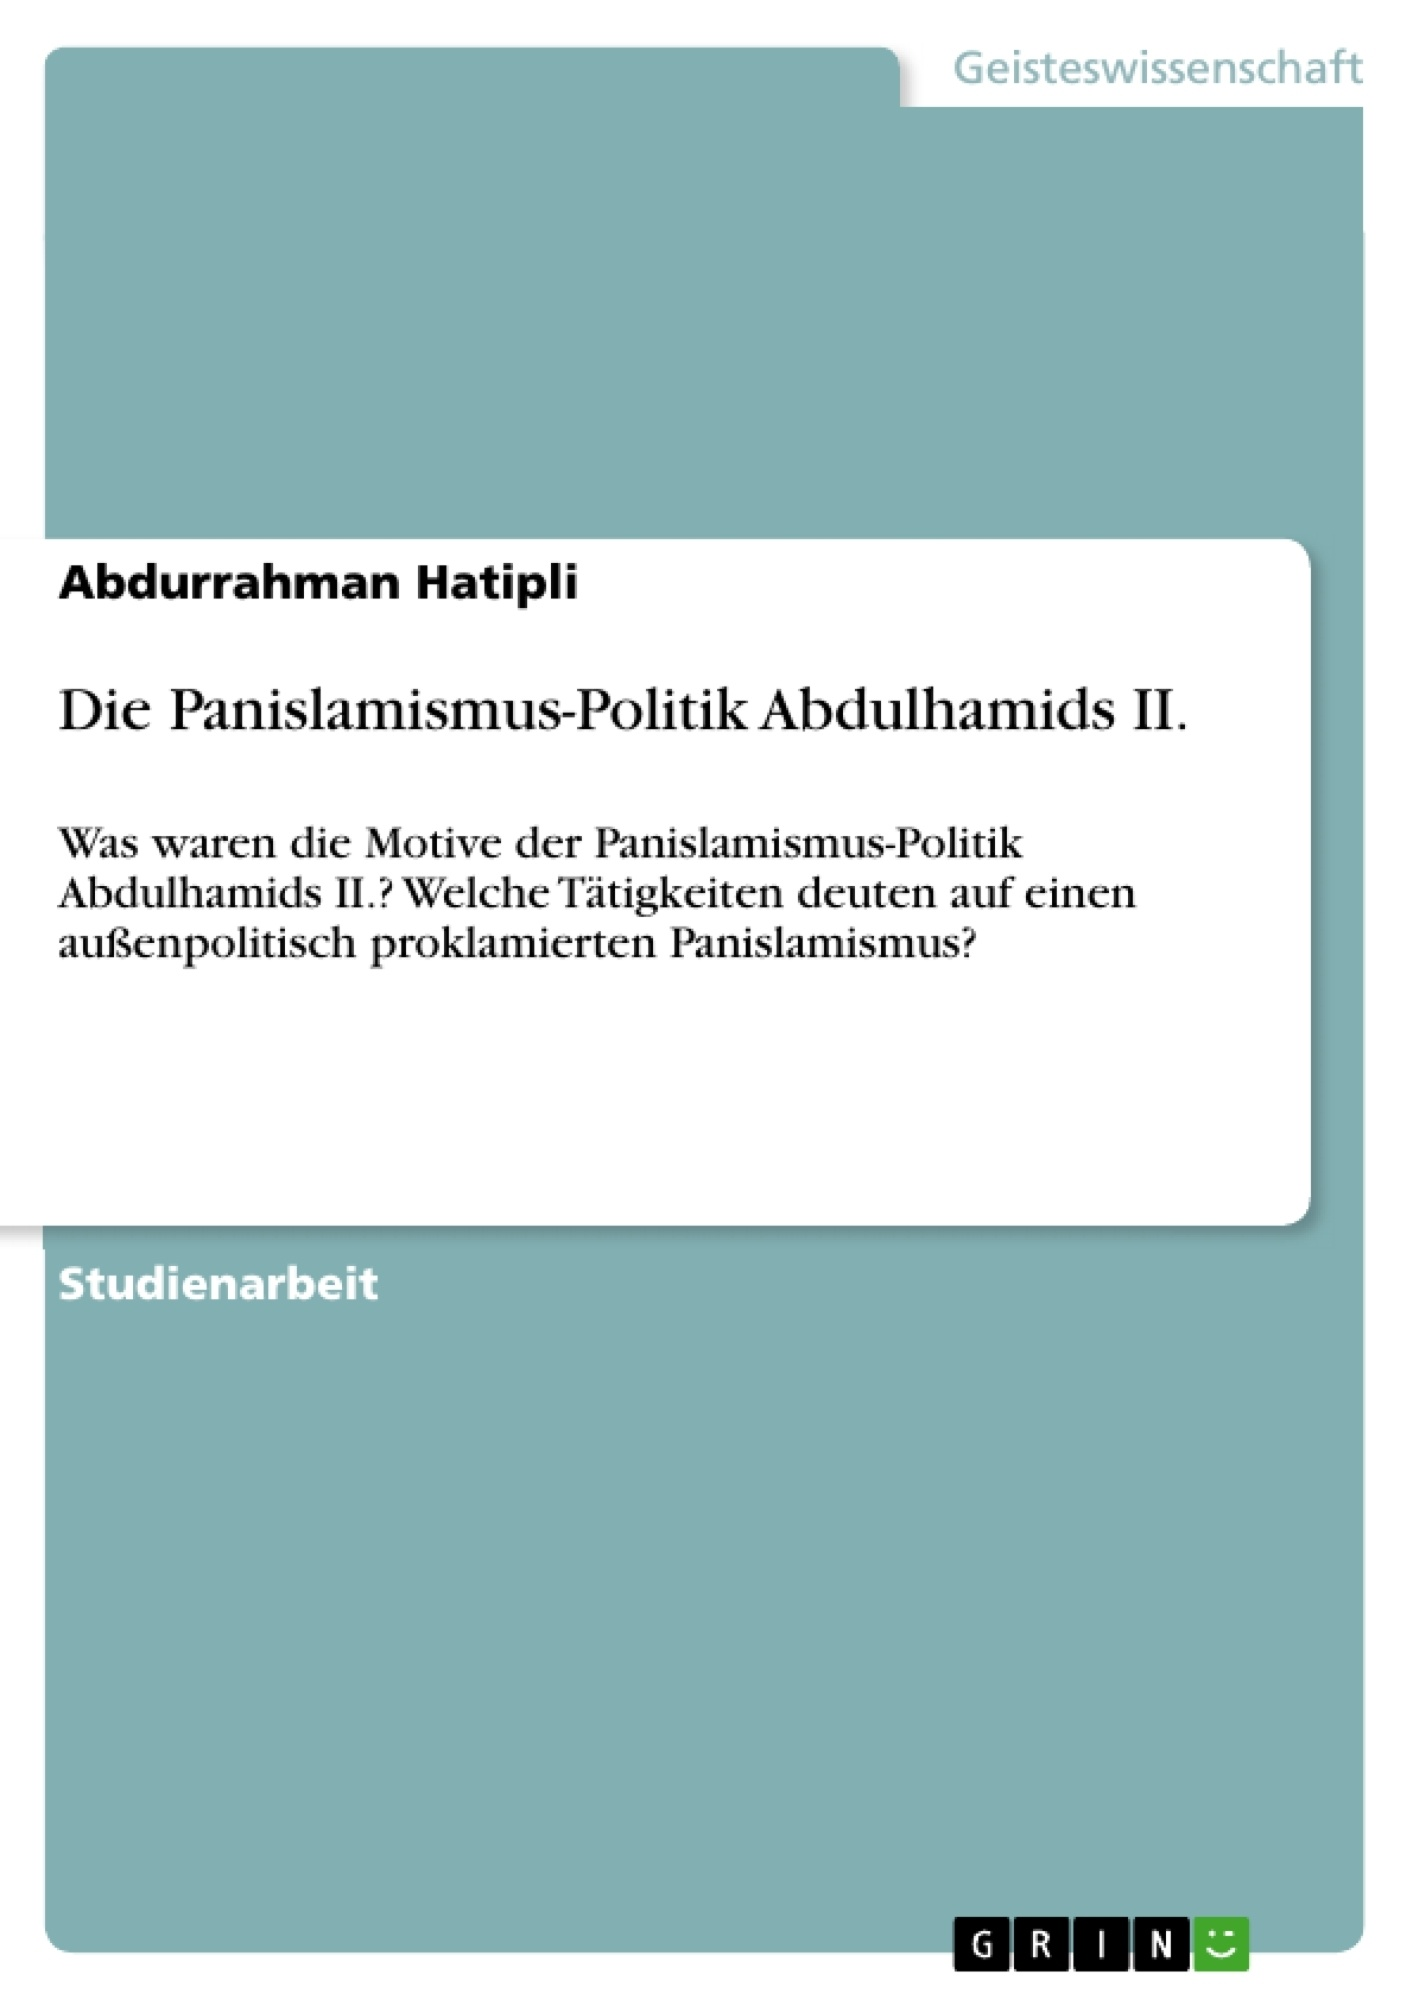 Titel: Die Panislamismus-Politik Abdulhamids II.